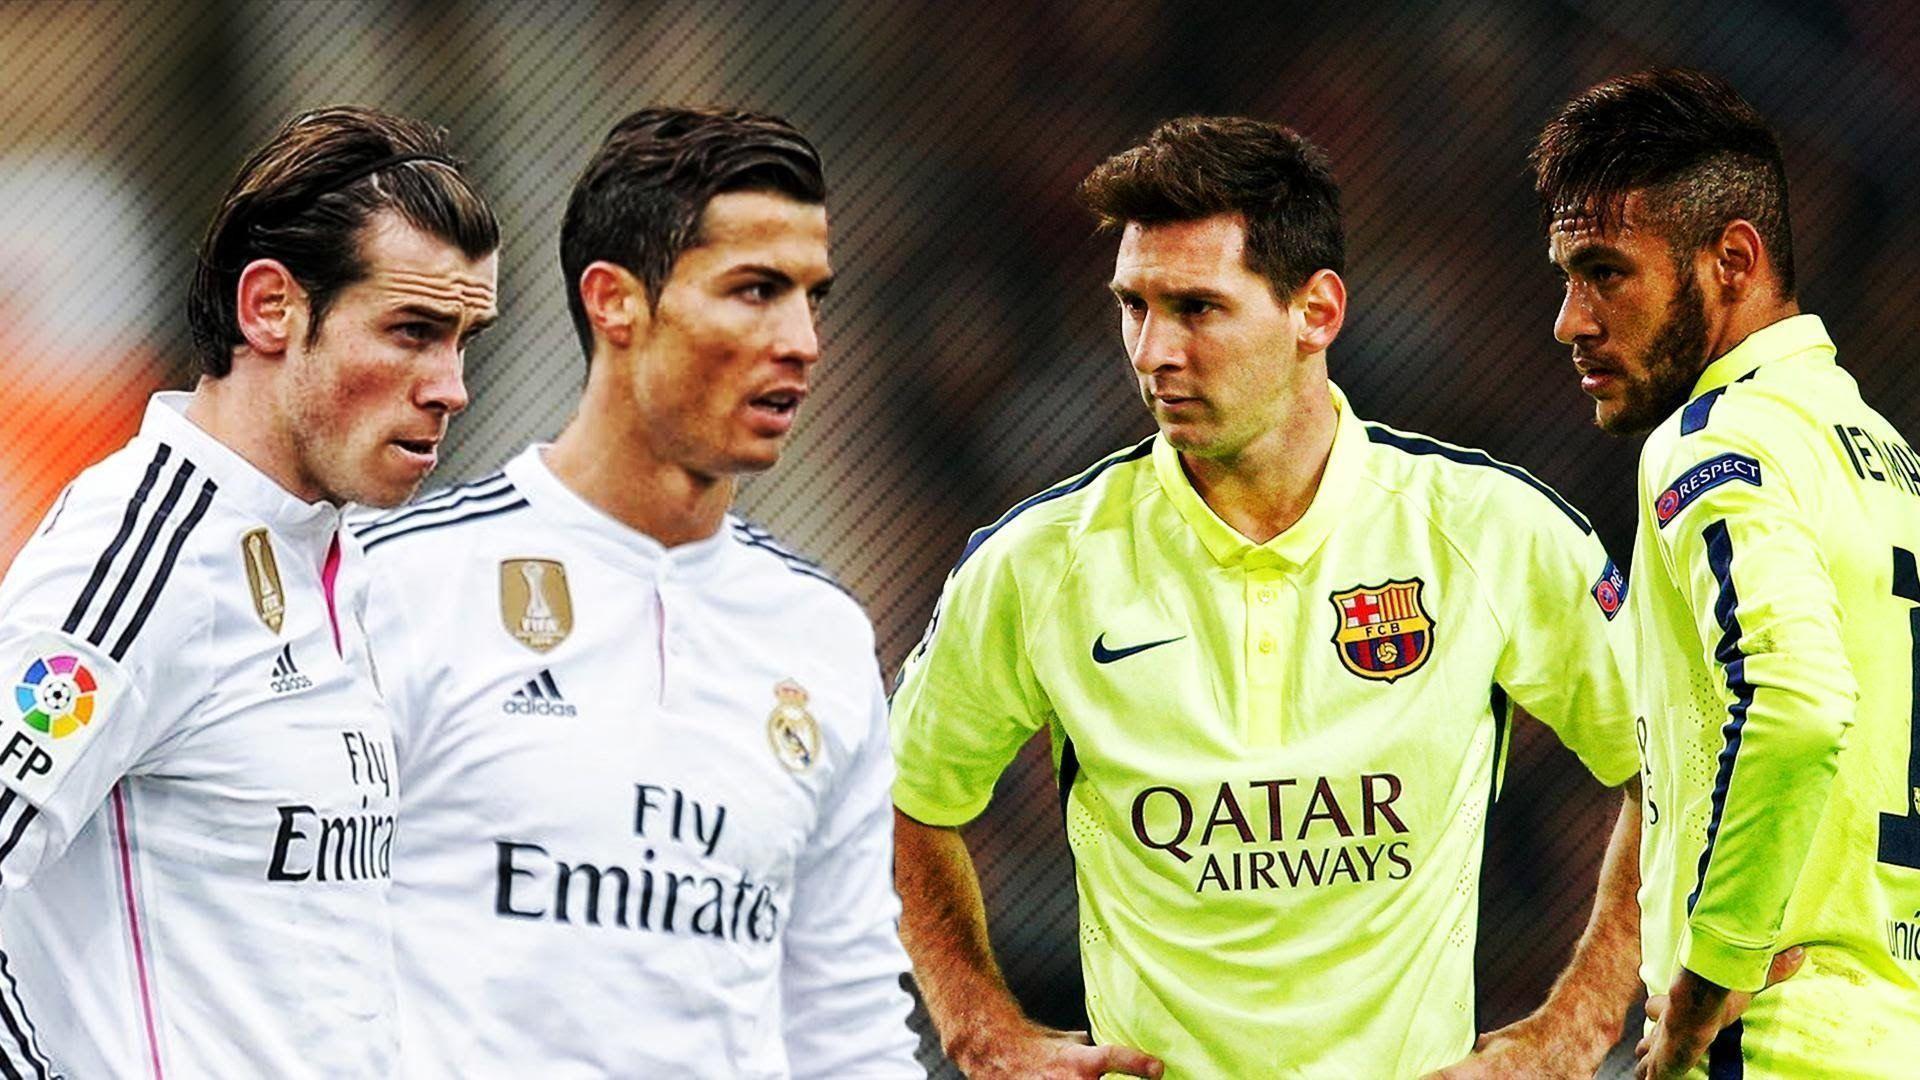 Messi And Neymar Vs Ronaldo And Bale Wallpaper messi vs ronaldo 2016 .